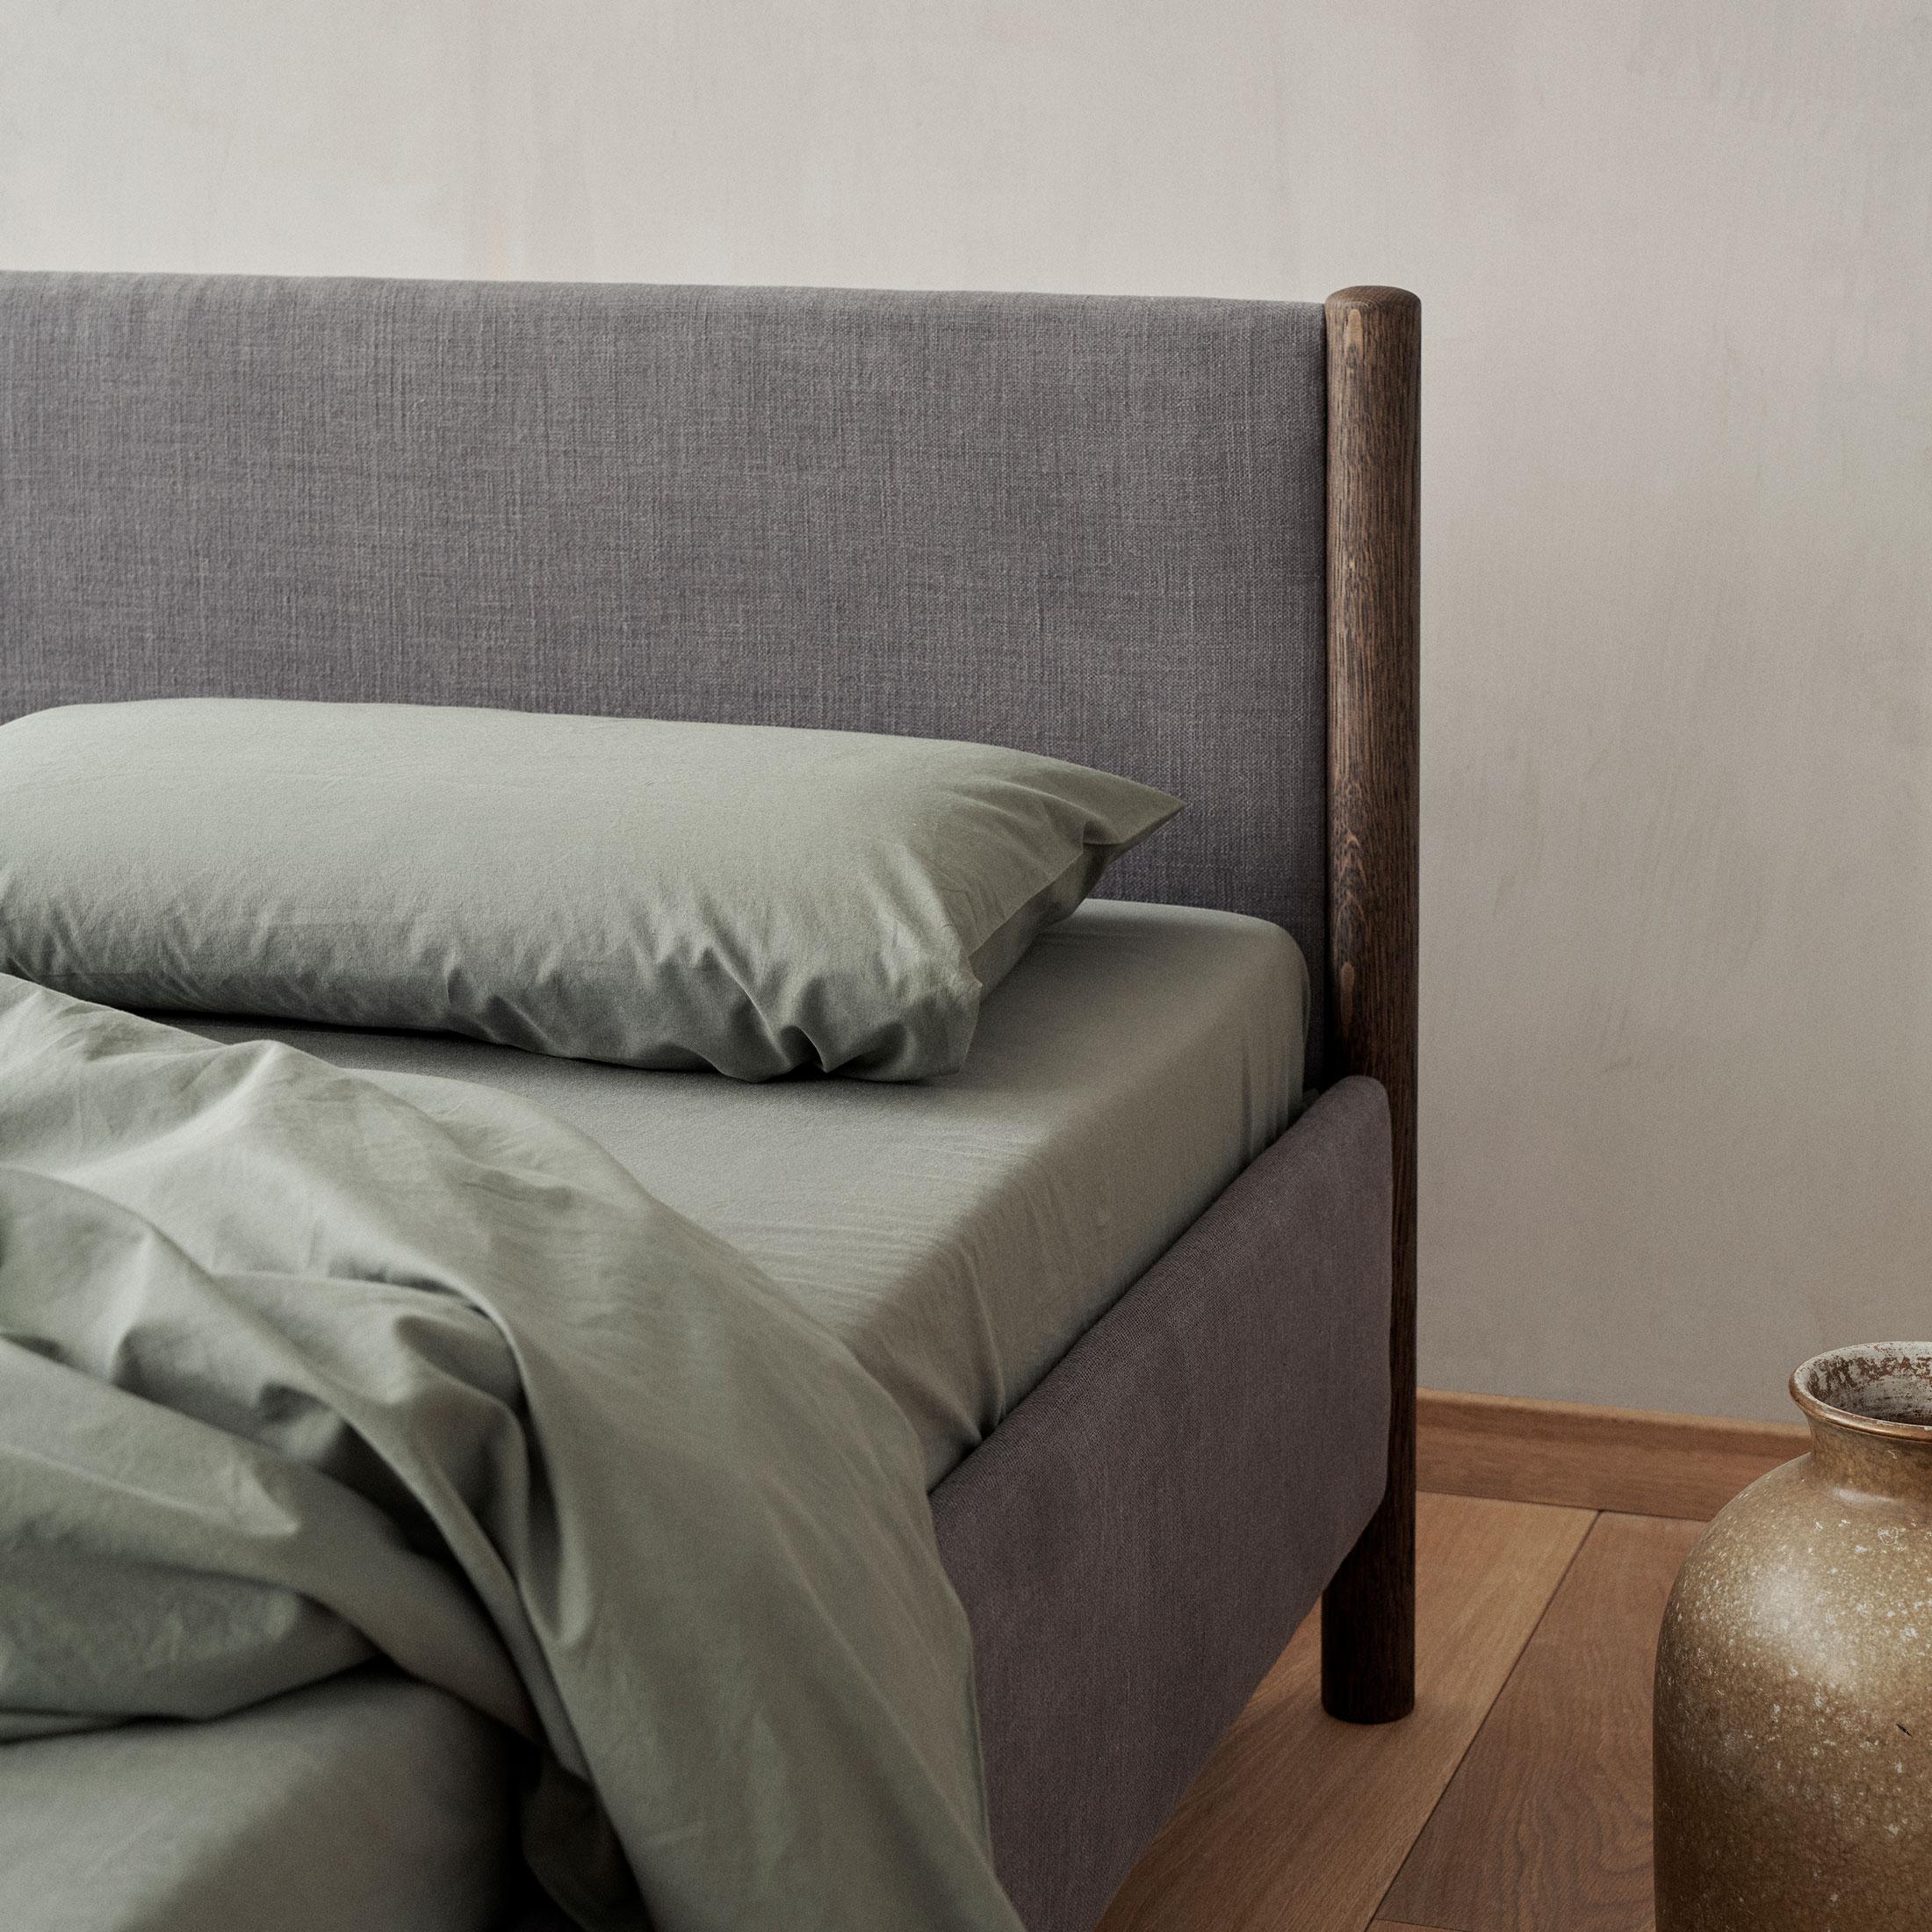 012-VENG-BED-AT-THE-LAB-RE-BEDS-DESIGN-BY-OLIVER-&-LUKAS-WEISSKROGH.jpg